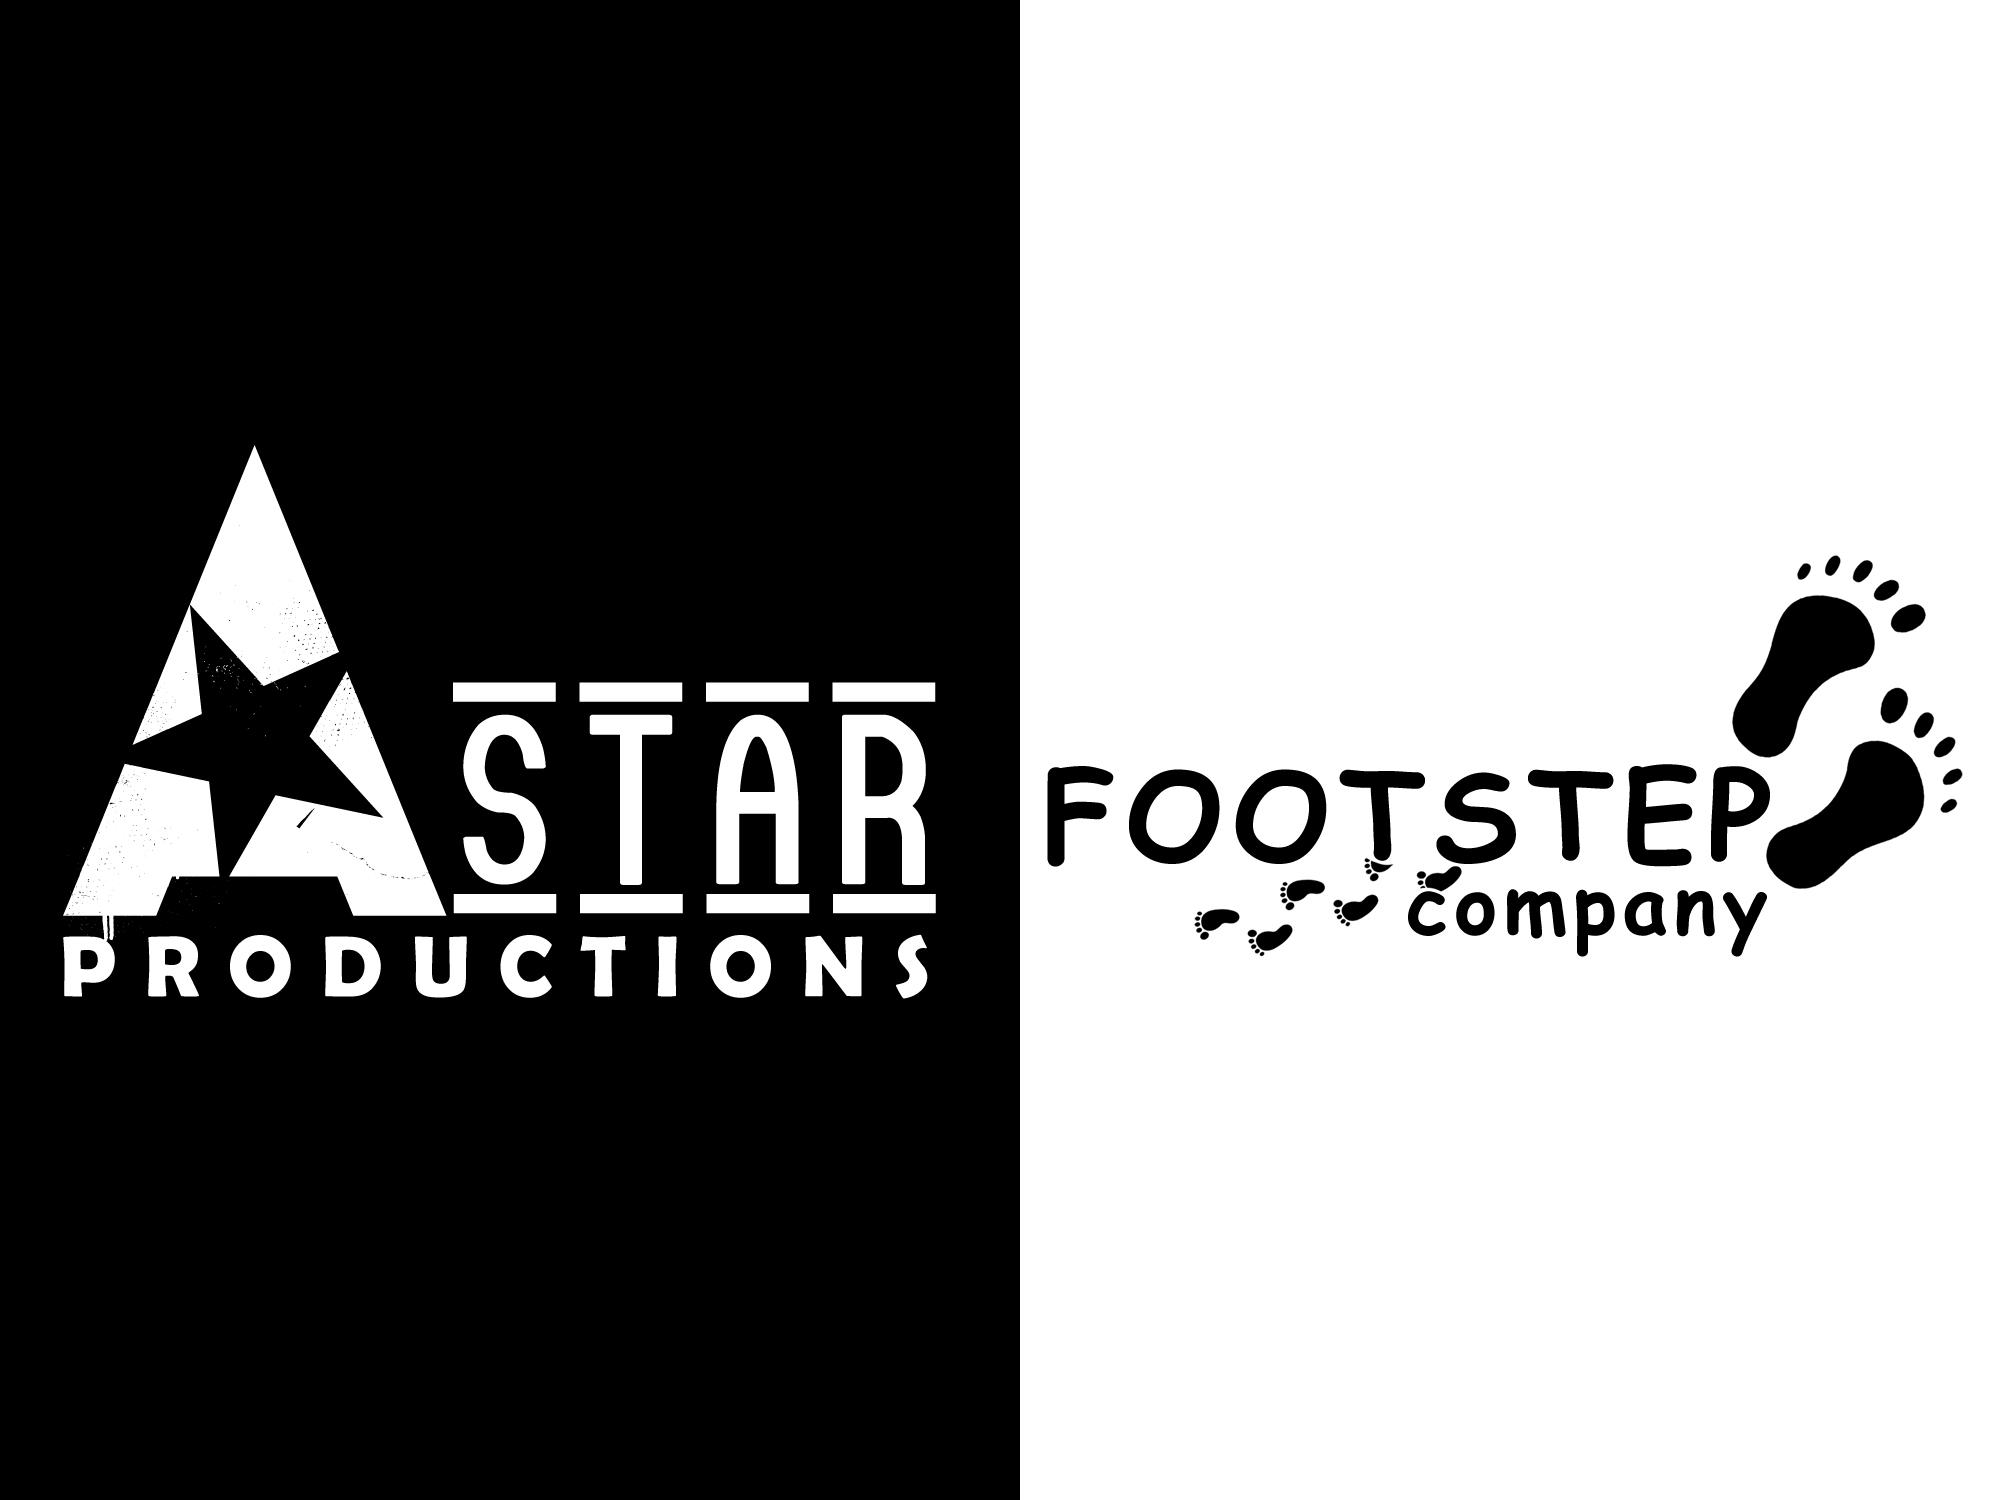 I will design amazing modern minimalist logo design